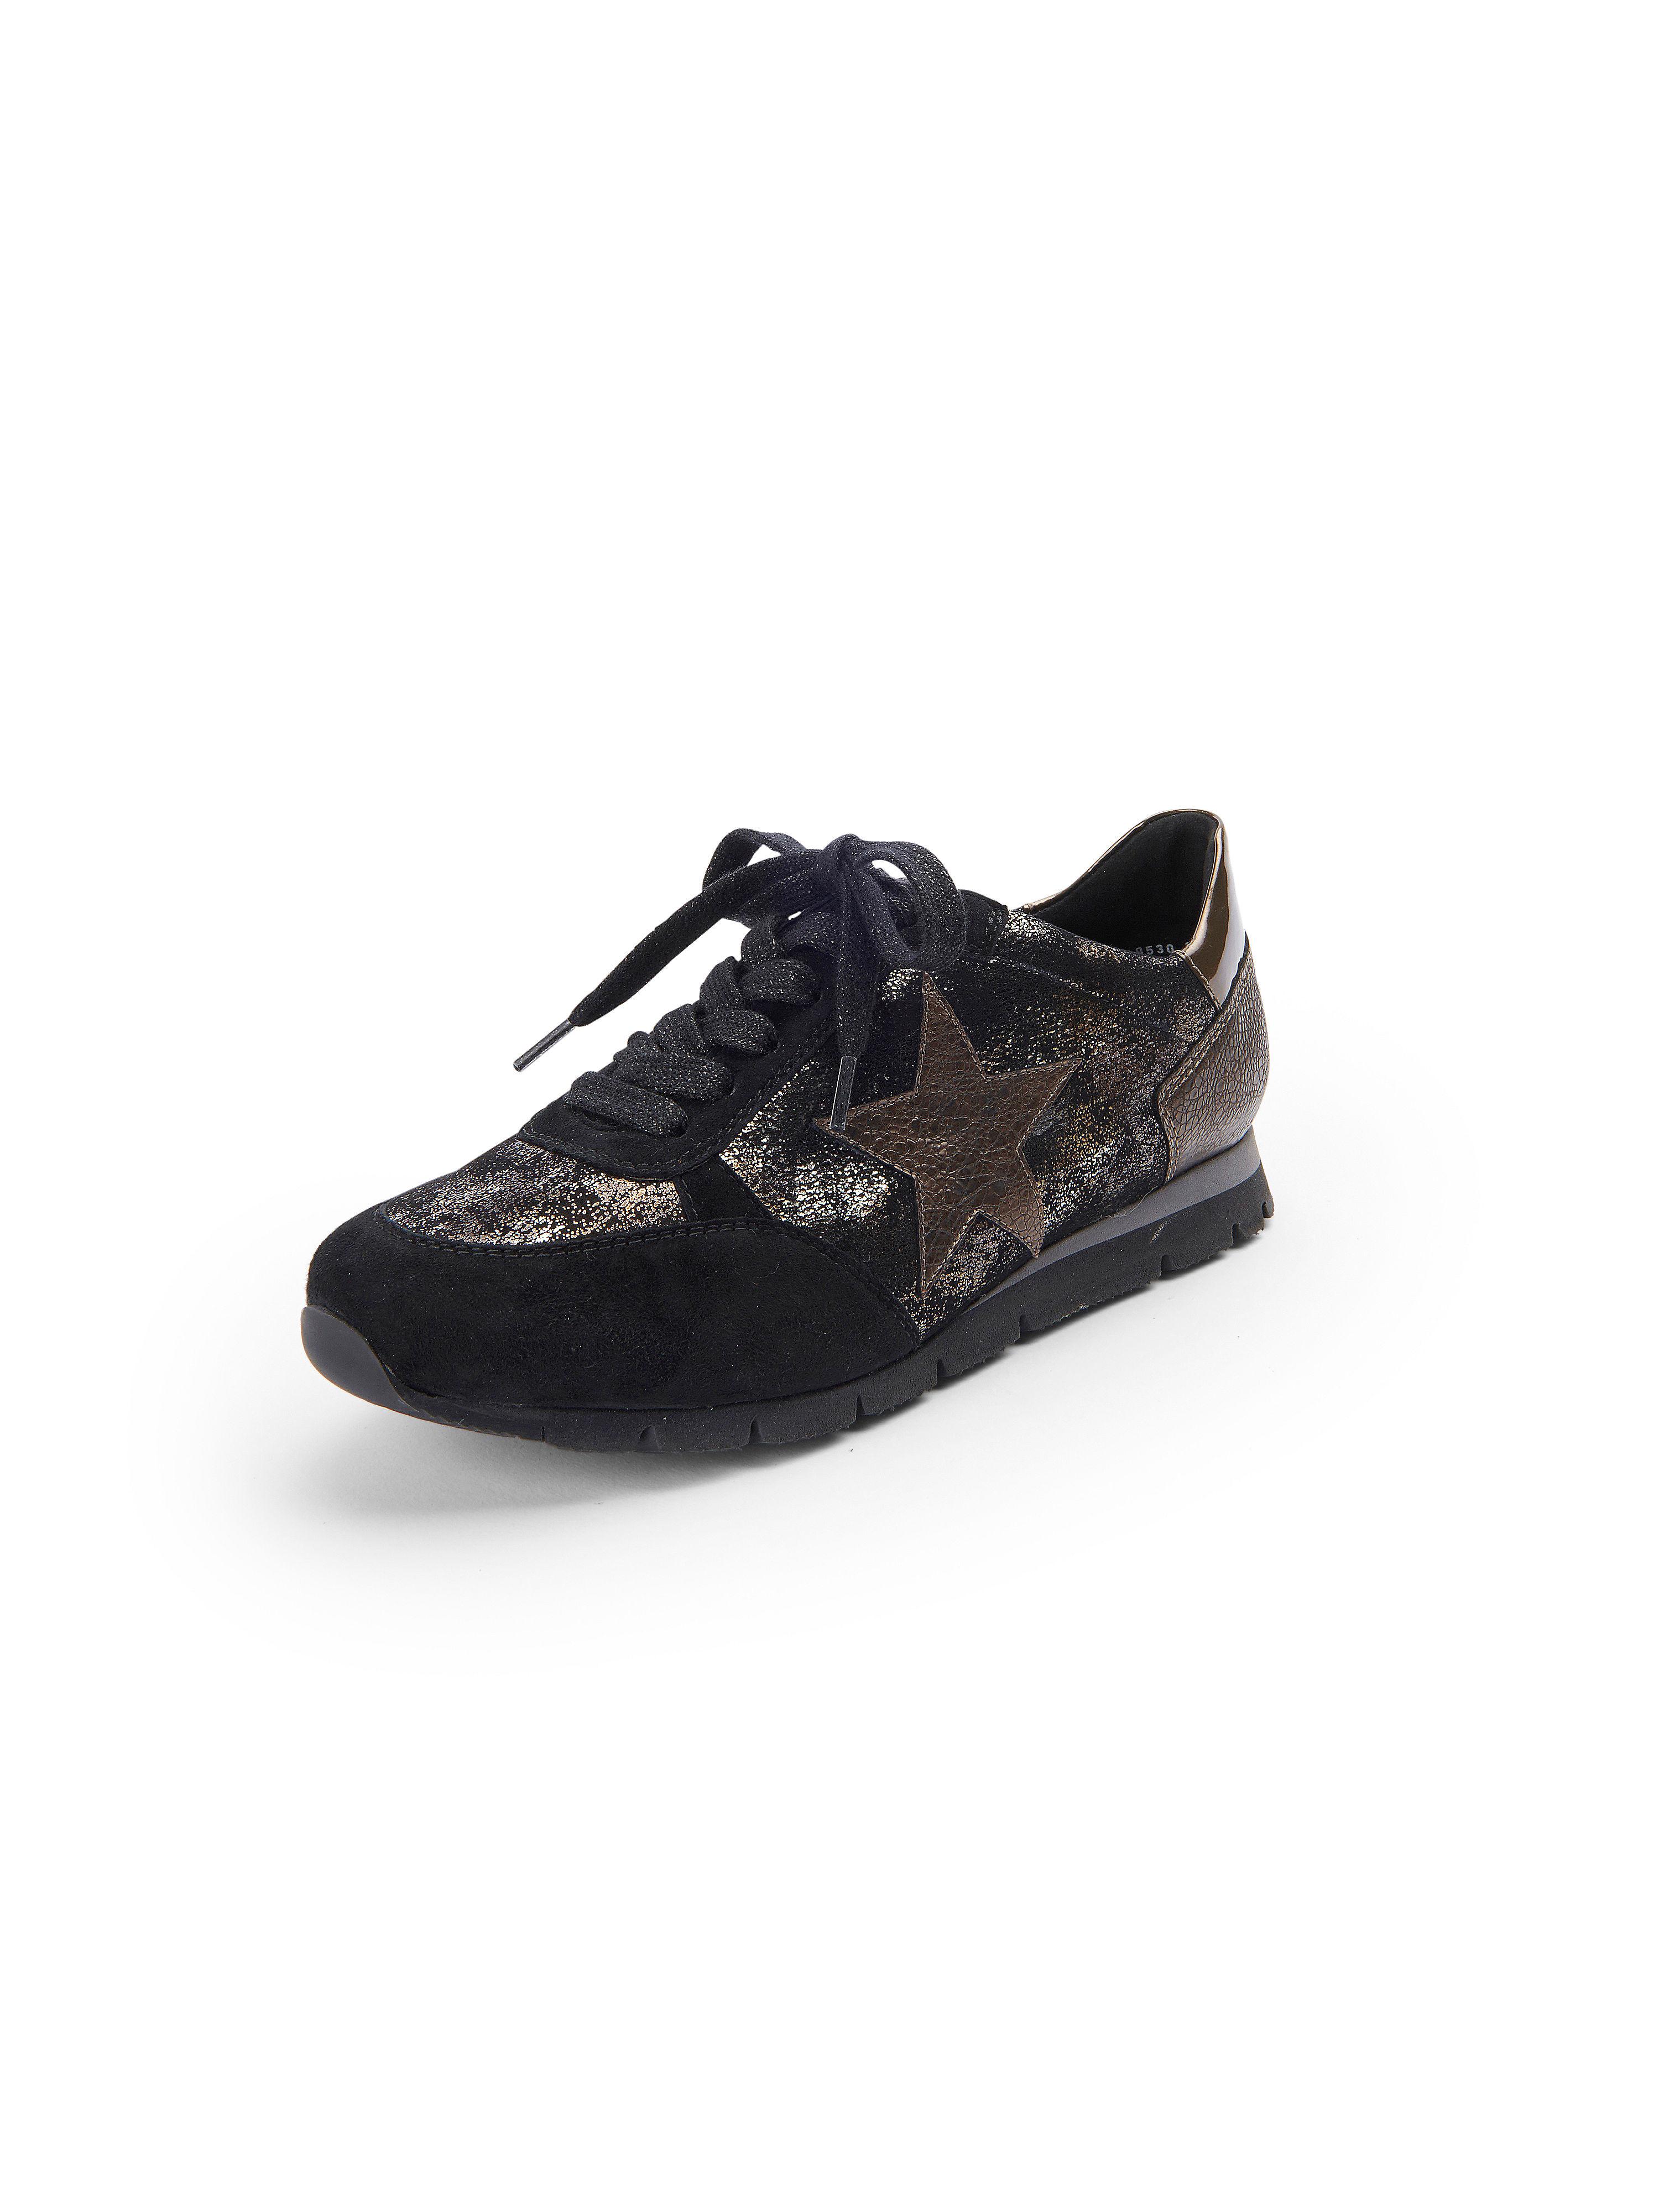 Image of Sneakers, model Rosa Van Semler zwart